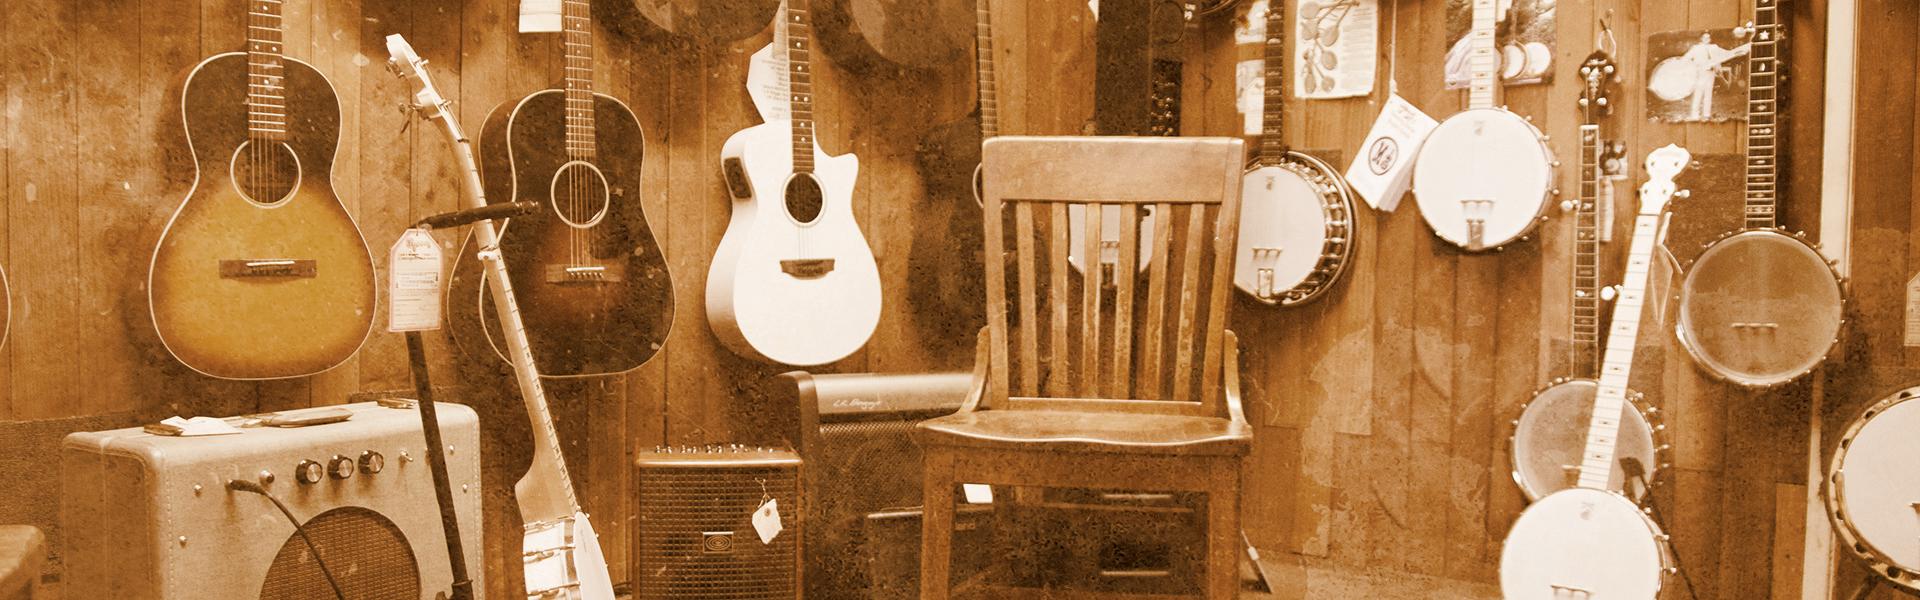 Private Lessons – McCabe's Guitar Shop